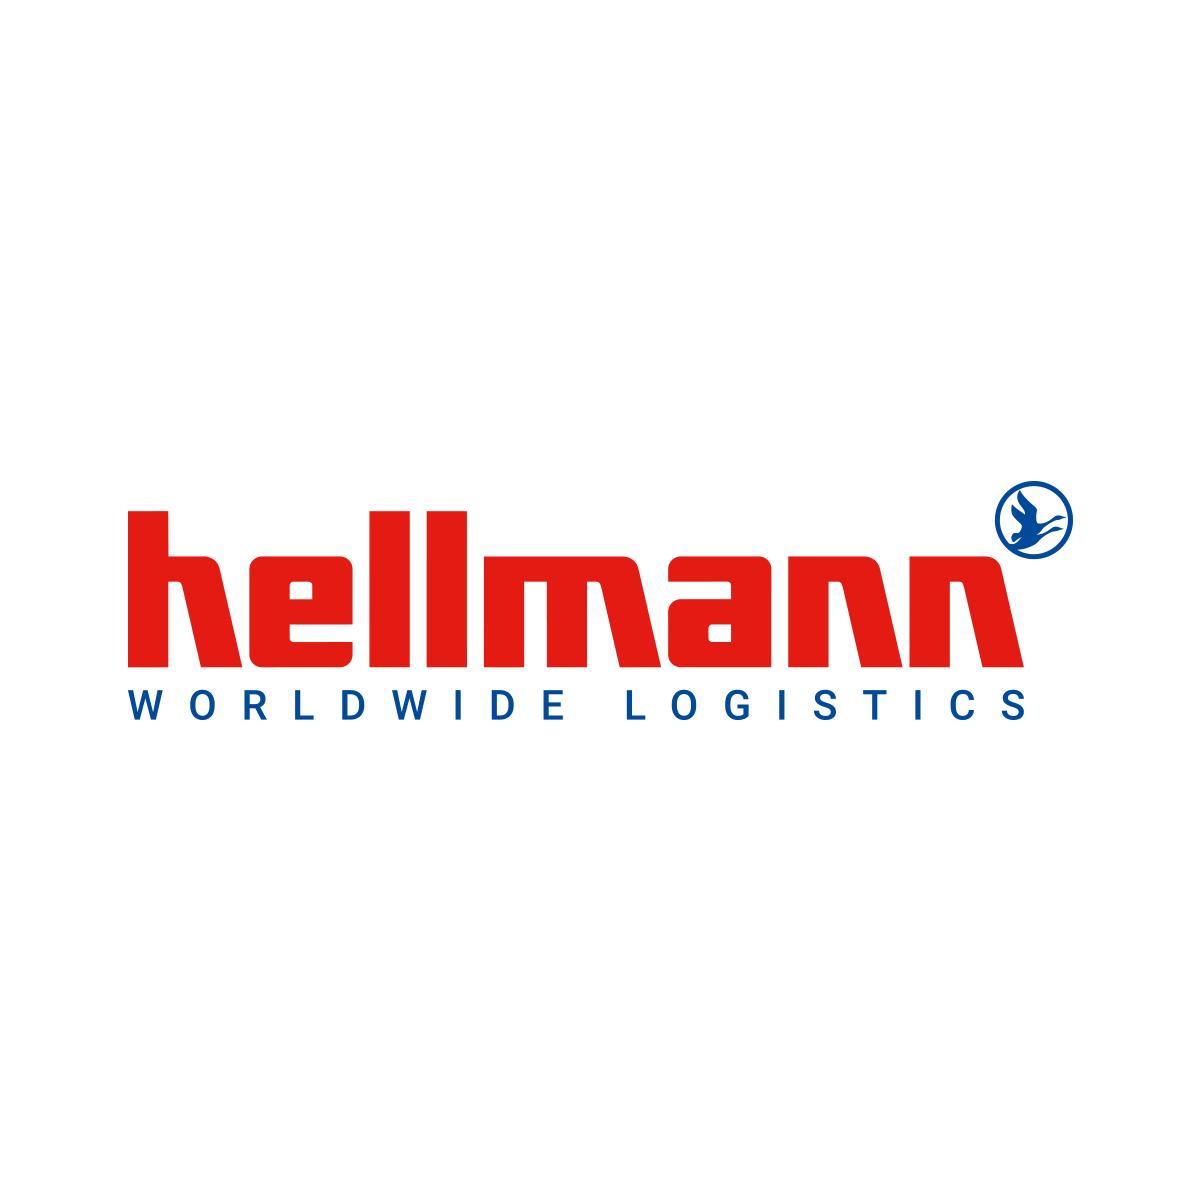 Hellmann Worldwide Logistics Jaipur